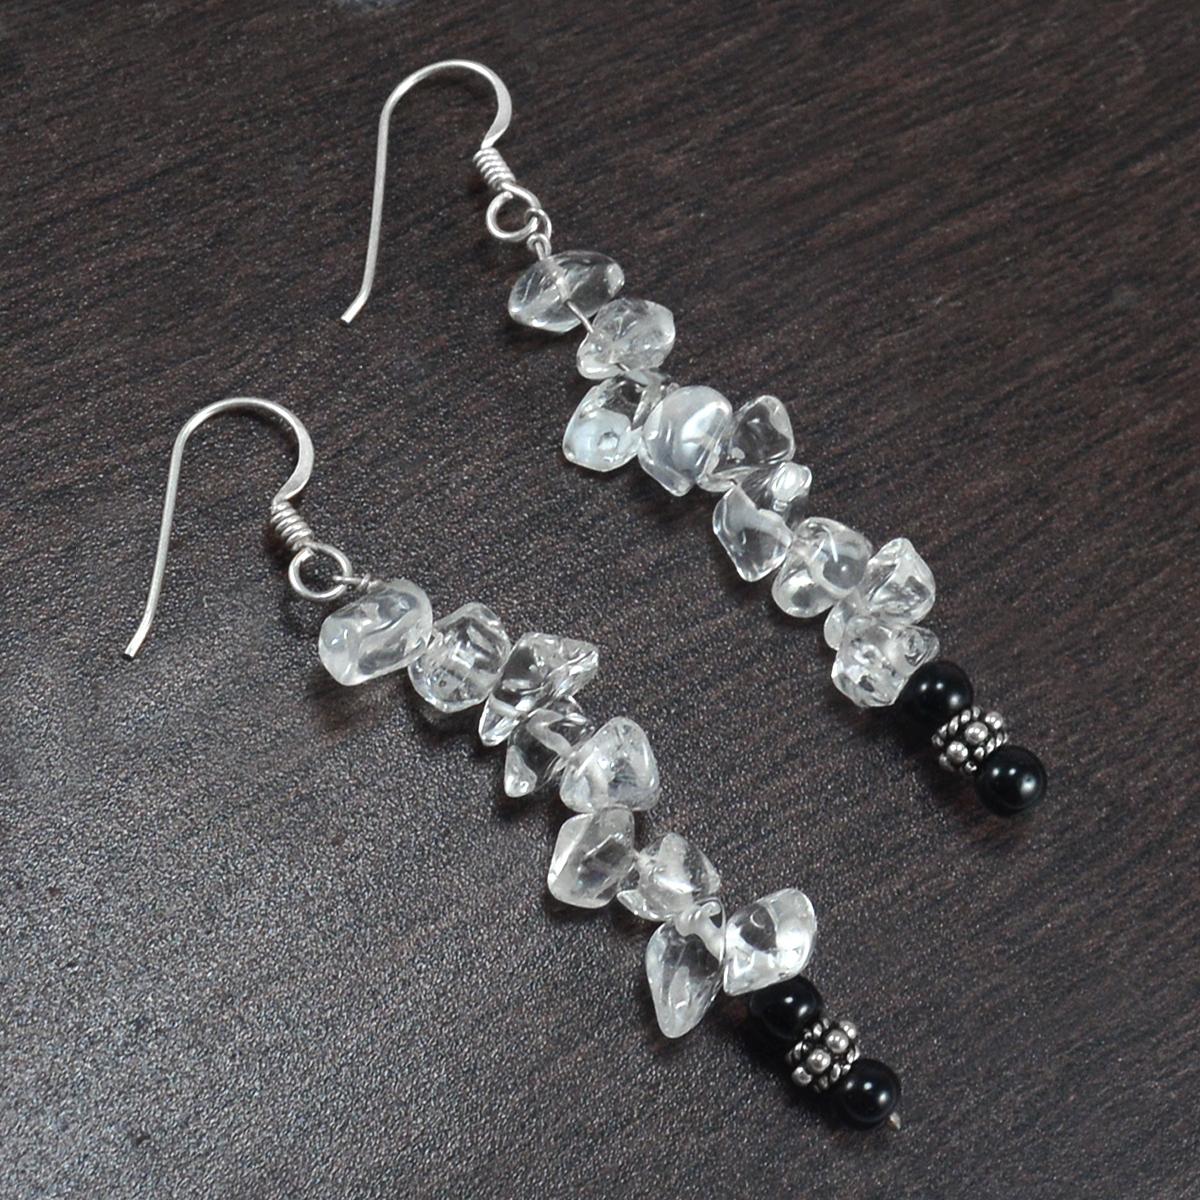 4mm Black Onyx & Handmade Jewelry Manufacturer Crystal Quartz 925 Sterling Silver Dangle Earring Jaipur Rajasthan India